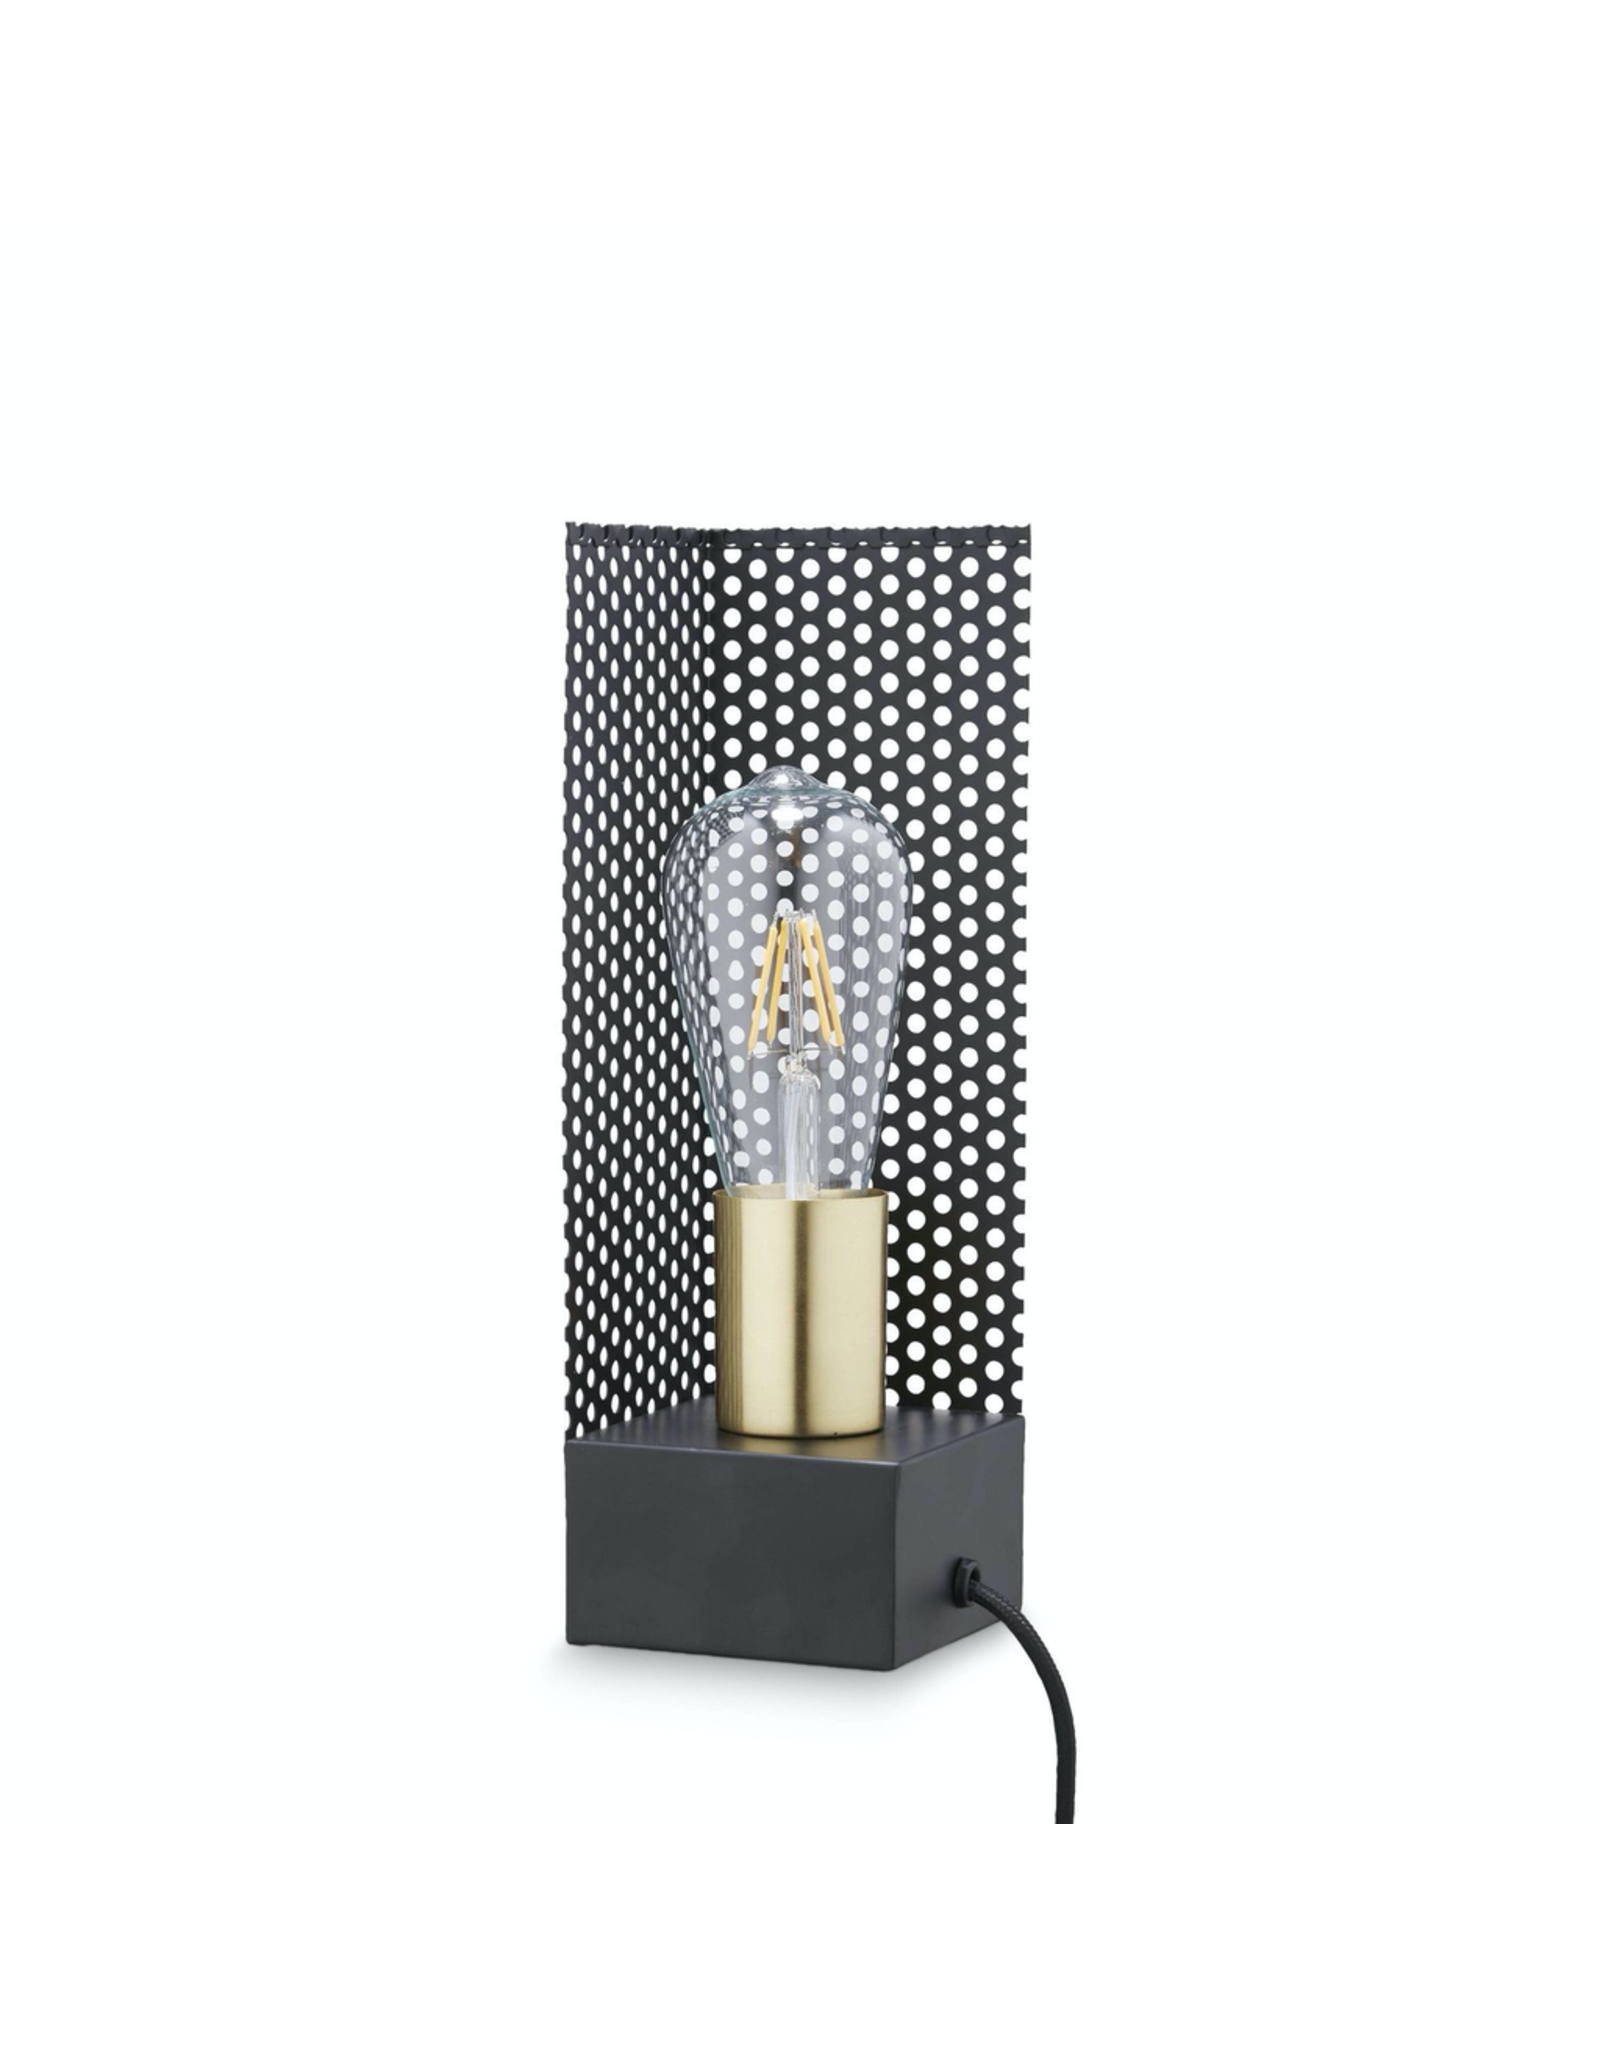 verlichting SQUARE LAMP W/WIRE 9X9 H:28CM BLACK-BRASS